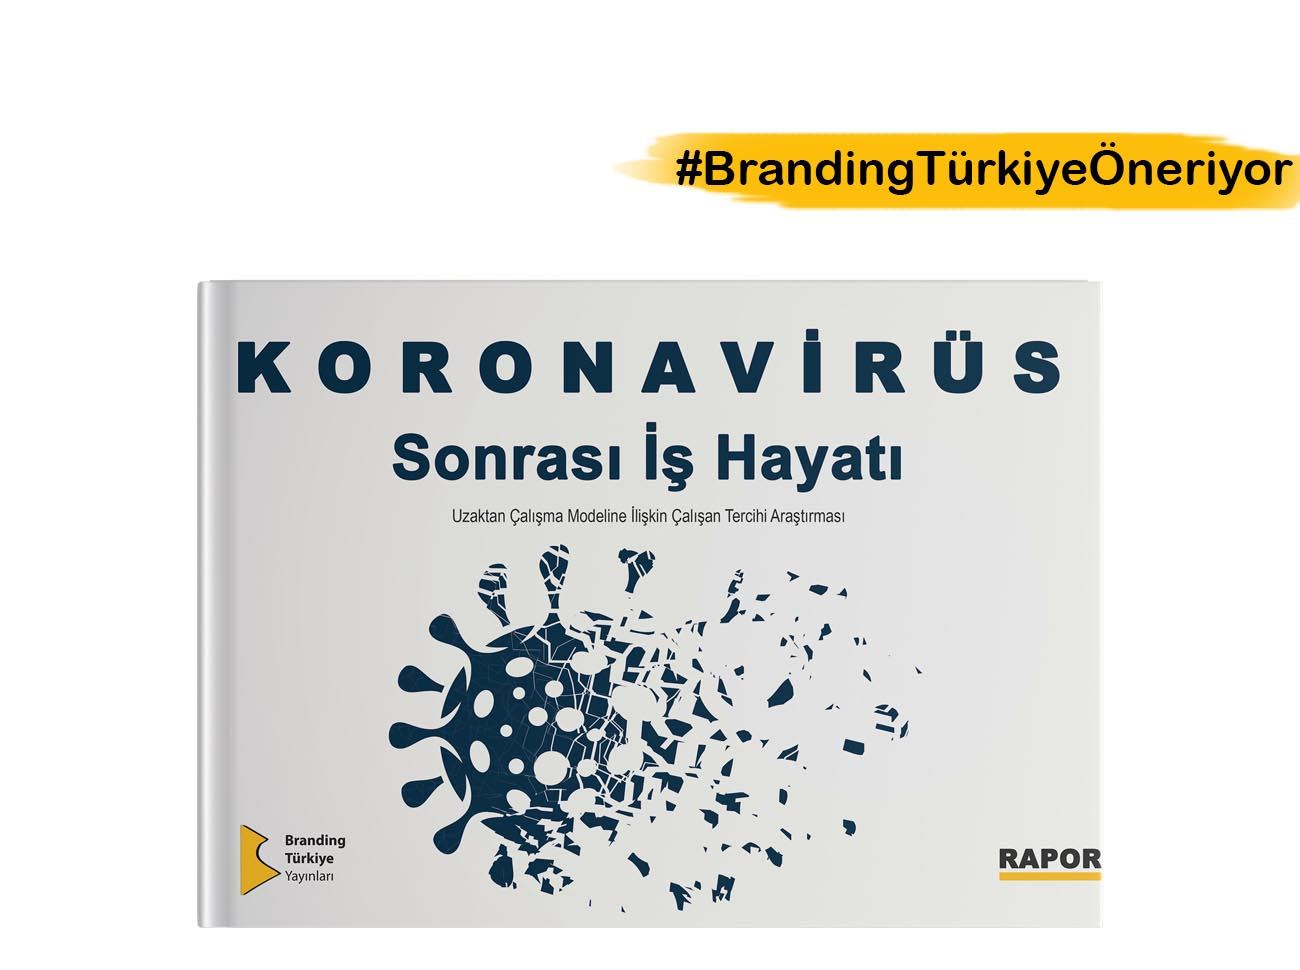 Koronavirüs Sonrası İş Hayatı Raporu - Mürsel Ferhat Sağlam & Serenay Palabıyık